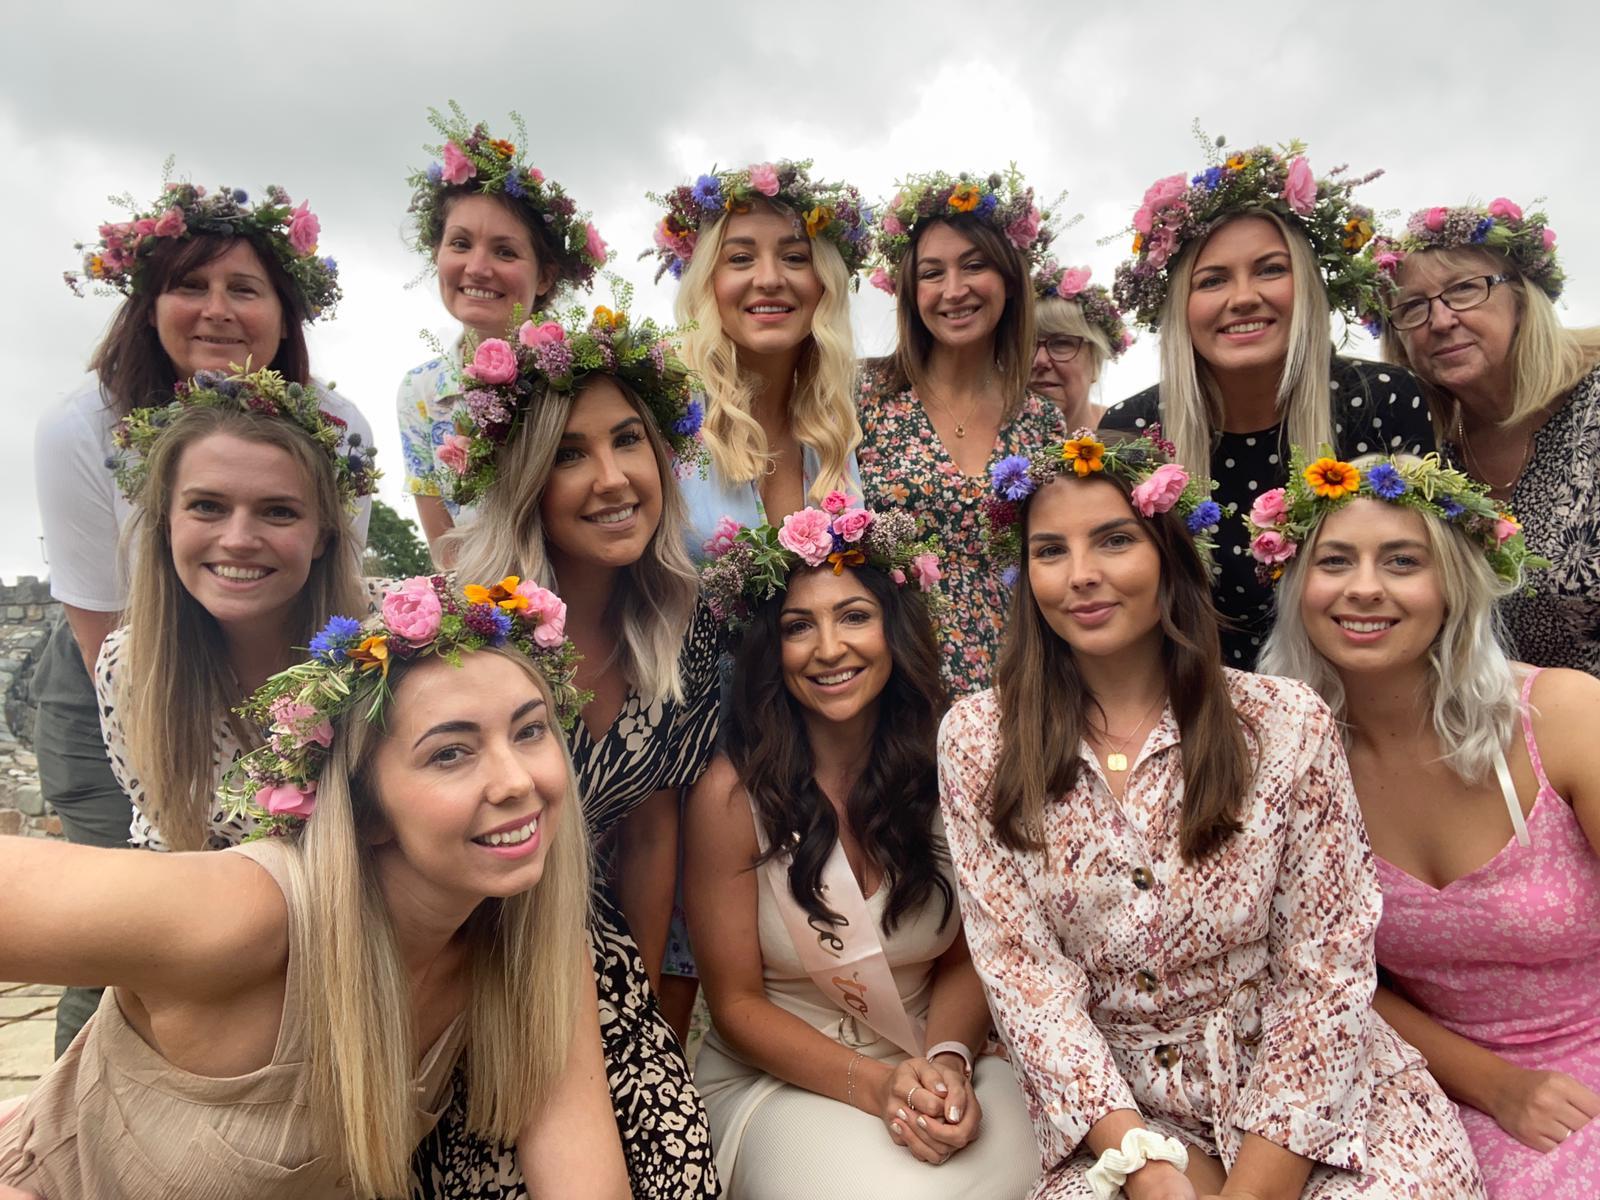 Flower crown hen party, Chehsire